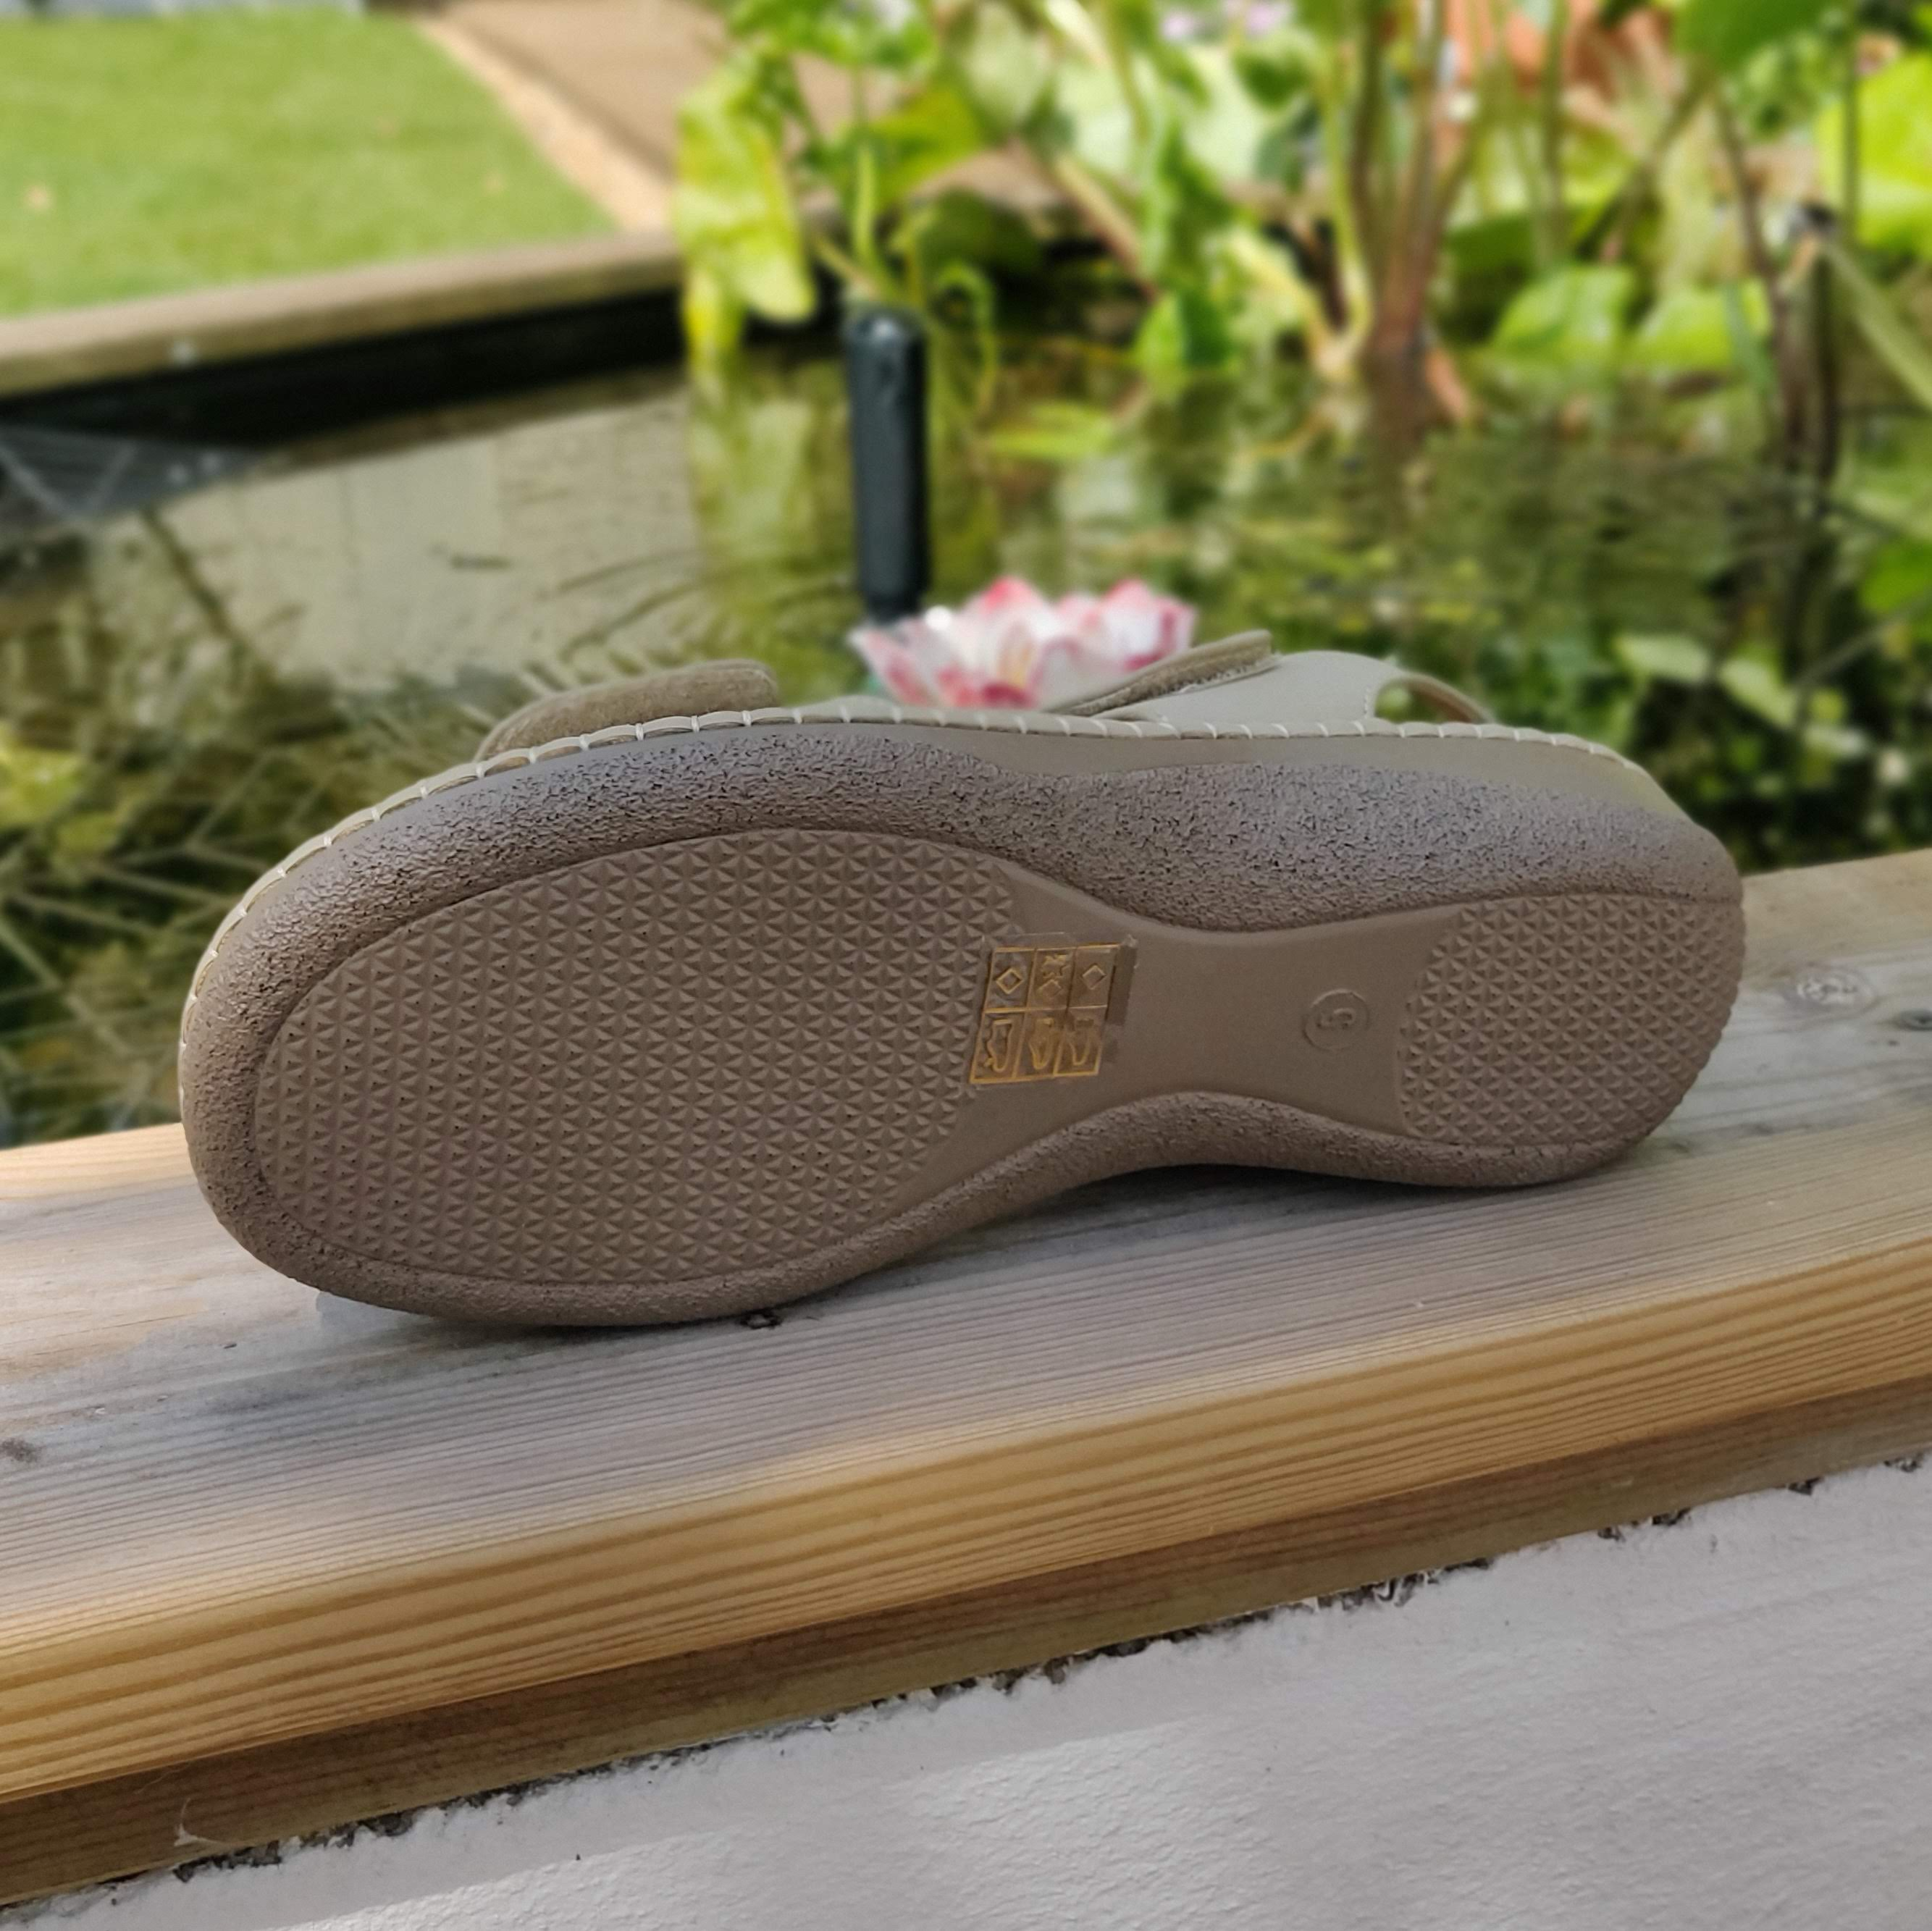 Ladies Beige and Stone Velcro Sandals